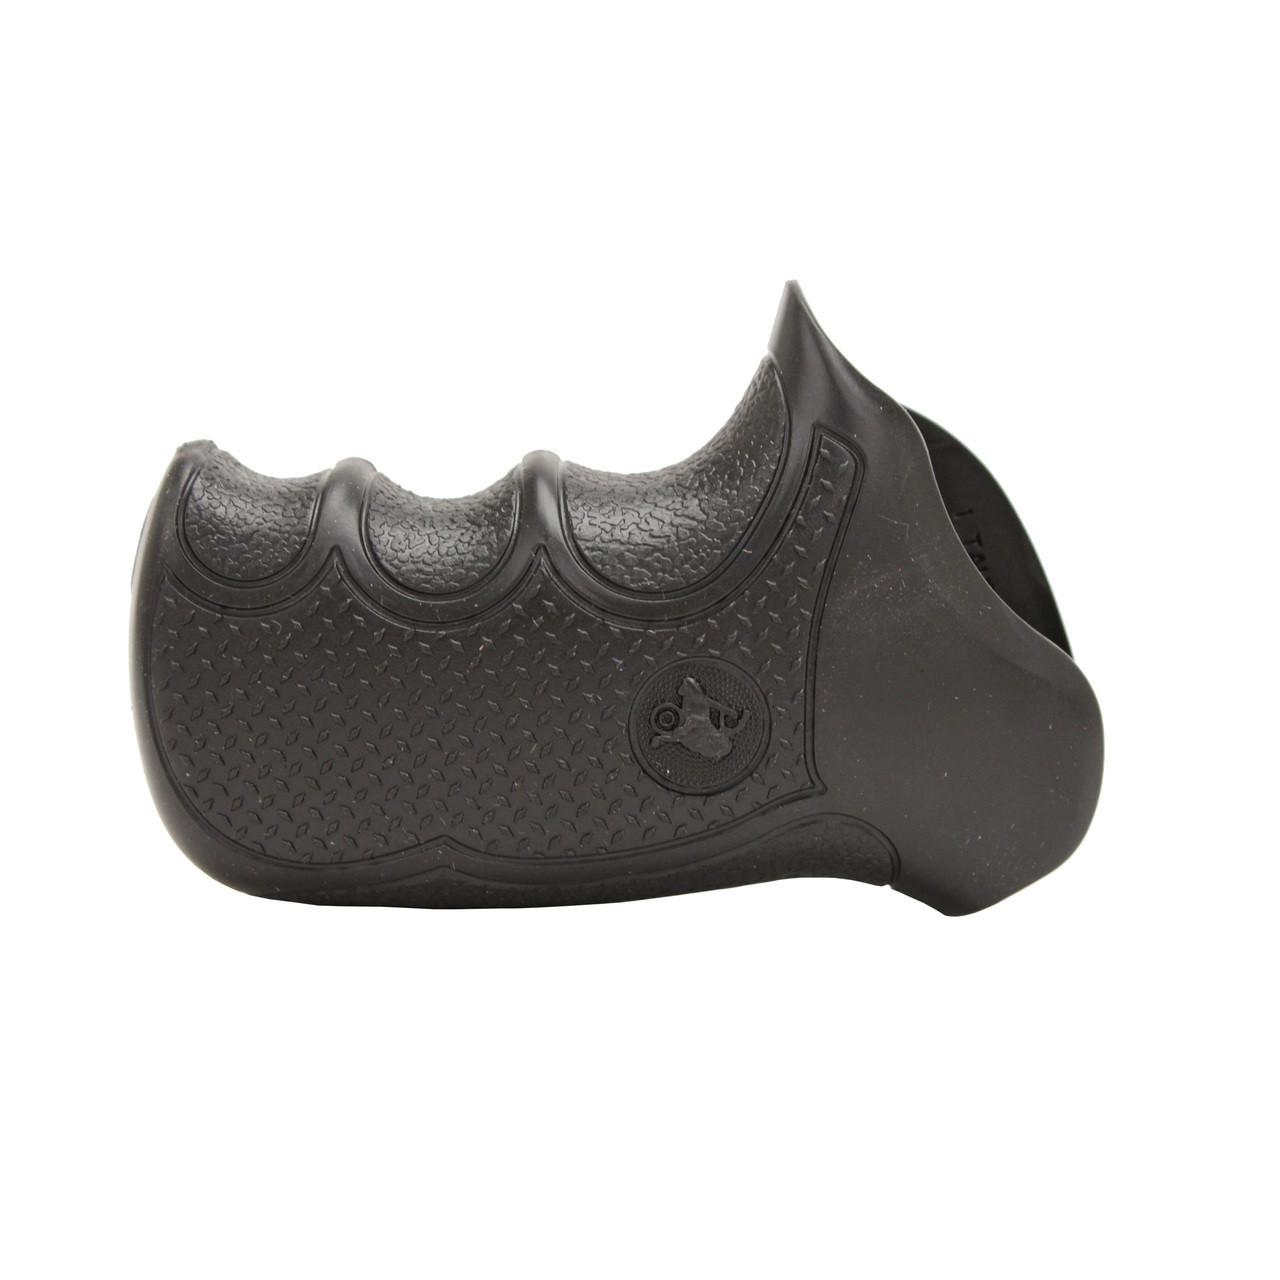 Pachmayr Dimond Pro Grip, Fits Taurus Cmp P-Defender, Black 02474, UPC :  034337024743